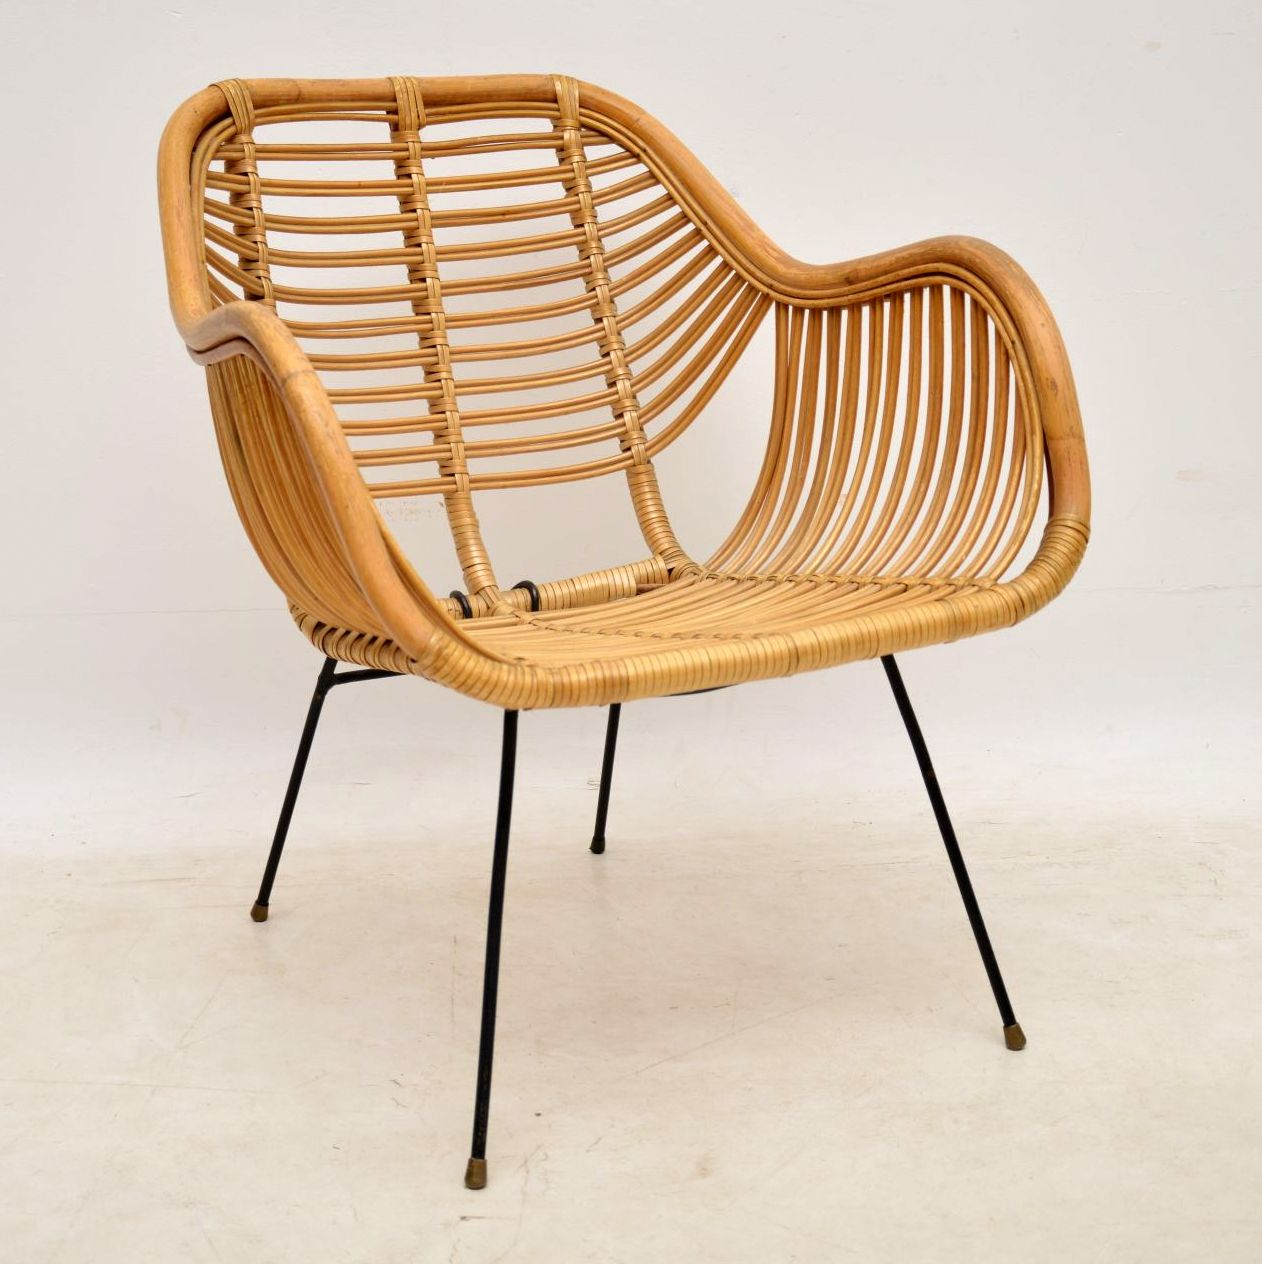 Outstanding 1960S Vintage Danish Rattan Armchair Retrospective Download Free Architecture Designs Salvmadebymaigaardcom